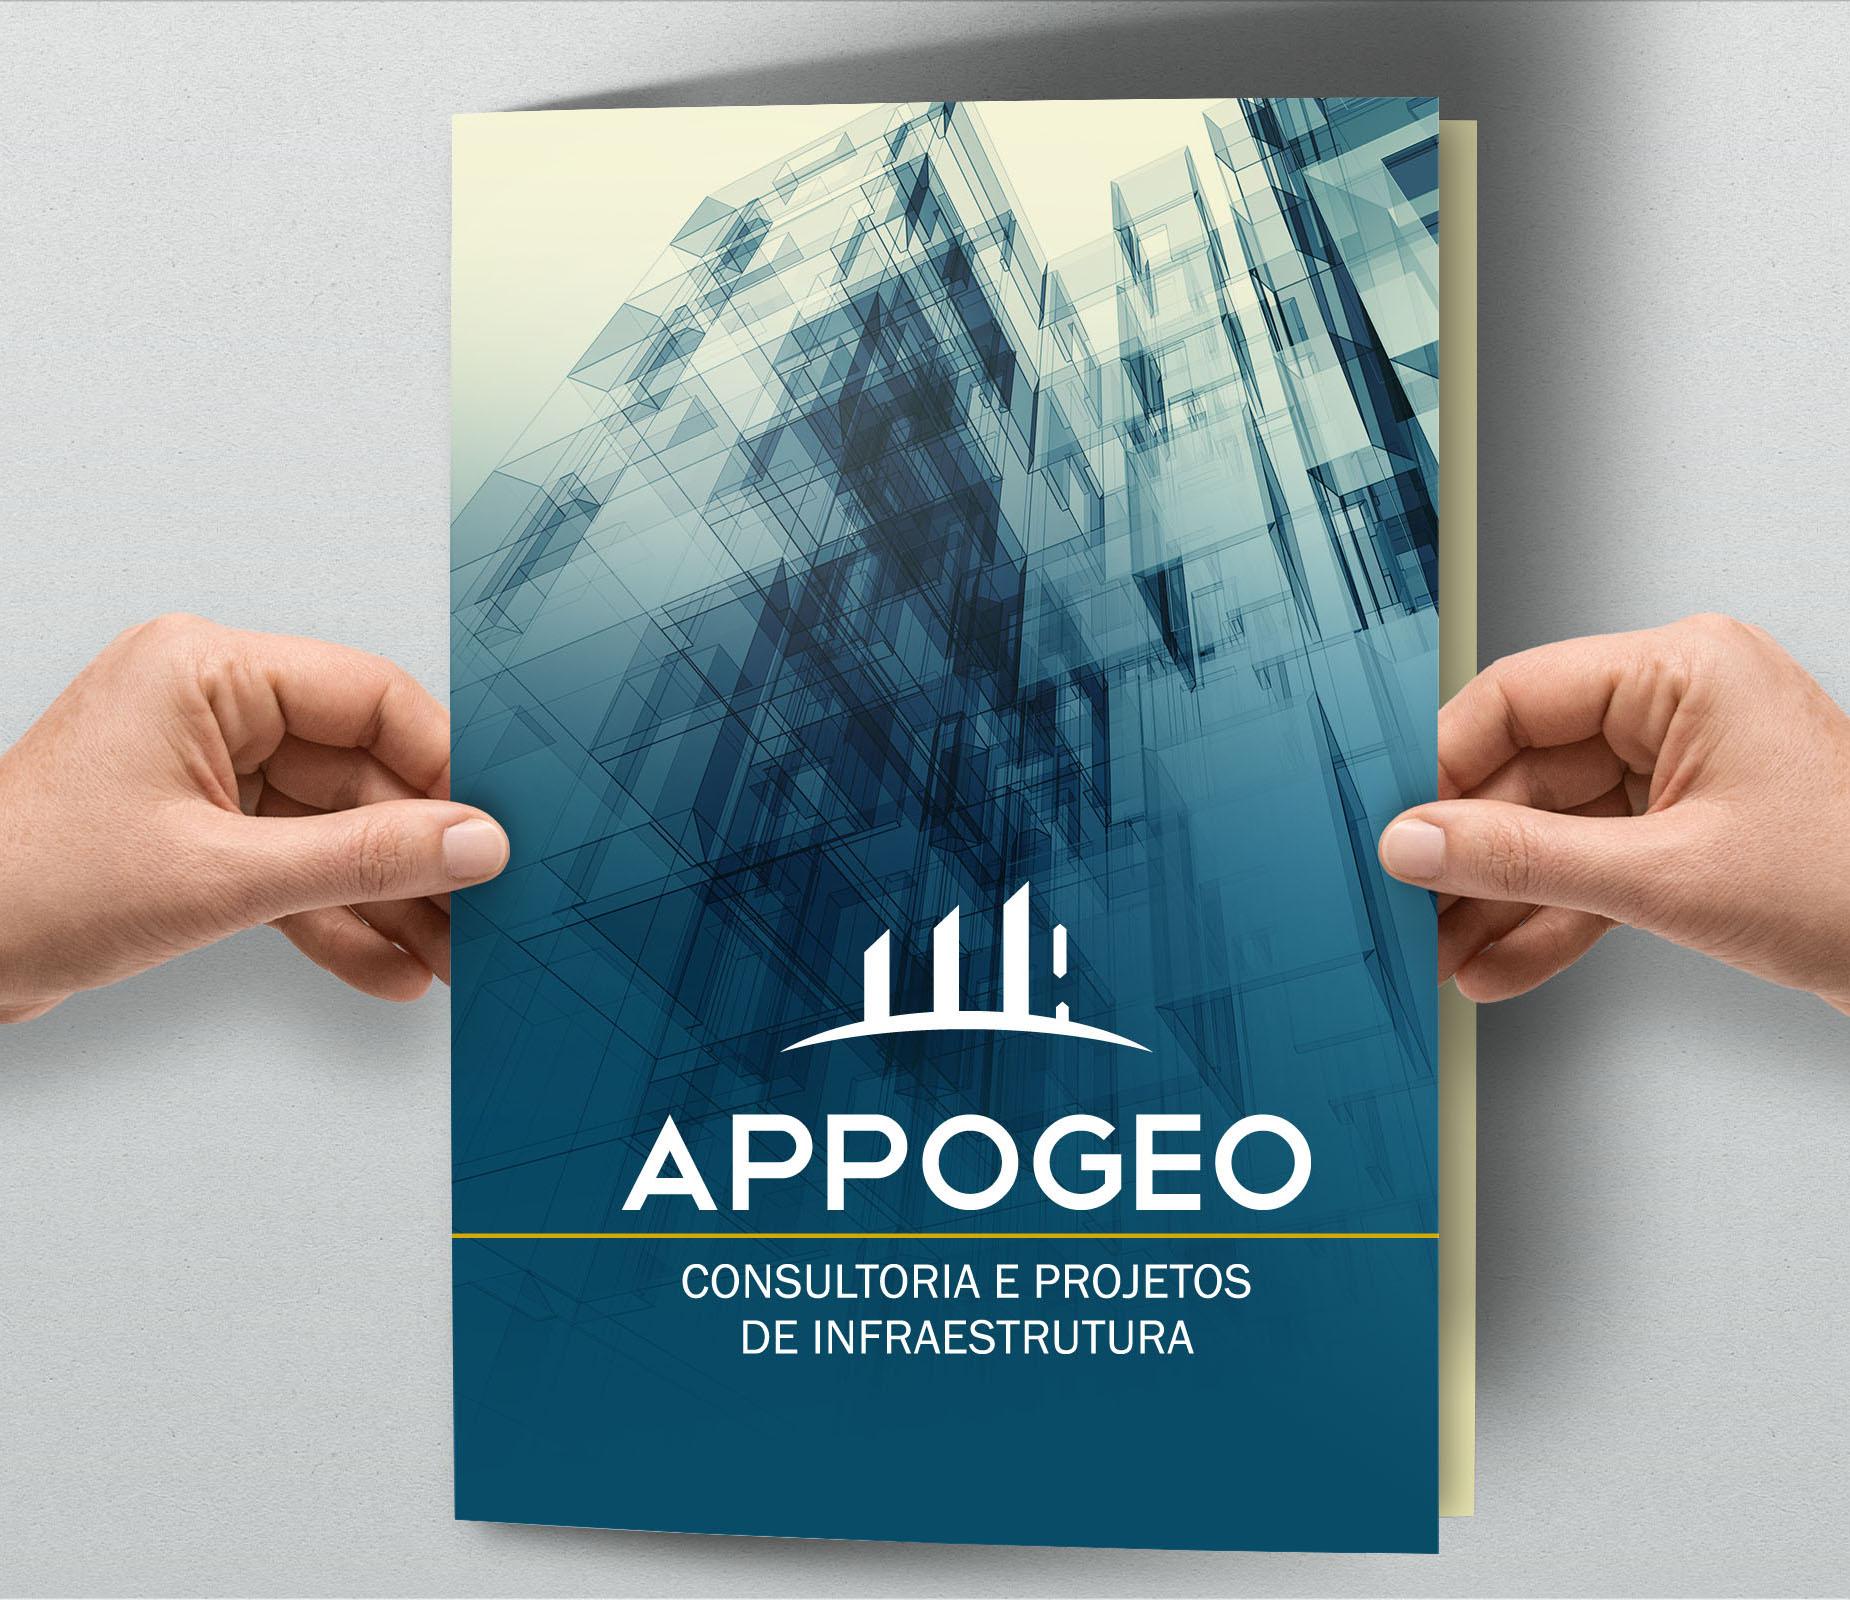 appogeo-folder-a4-v2-e